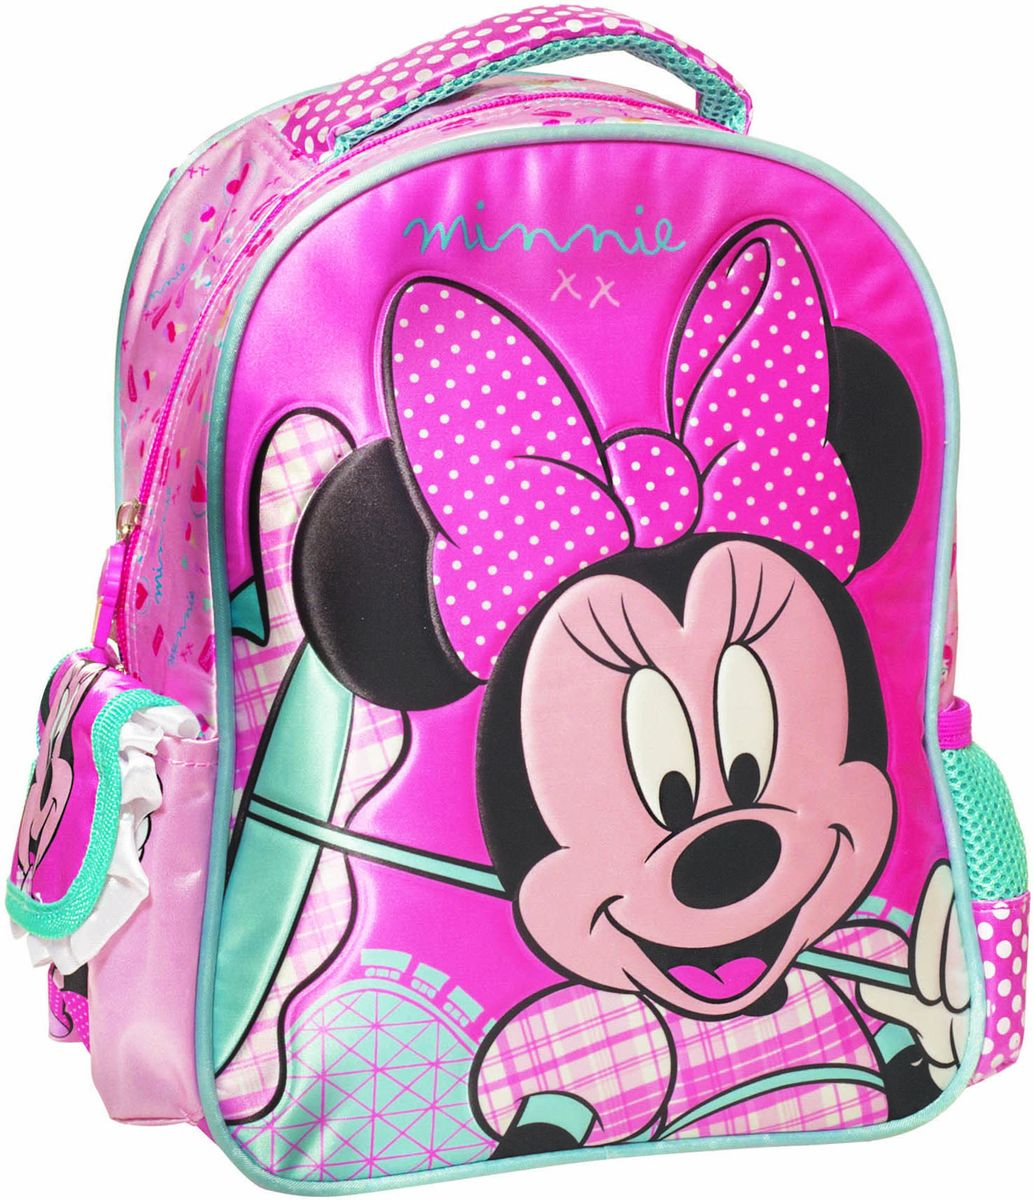 2d5df141450 Τσαντα Minnie | Σχολικές τσάντες (Ταξινόμηση: Φθηνότερα) | Snif.gr